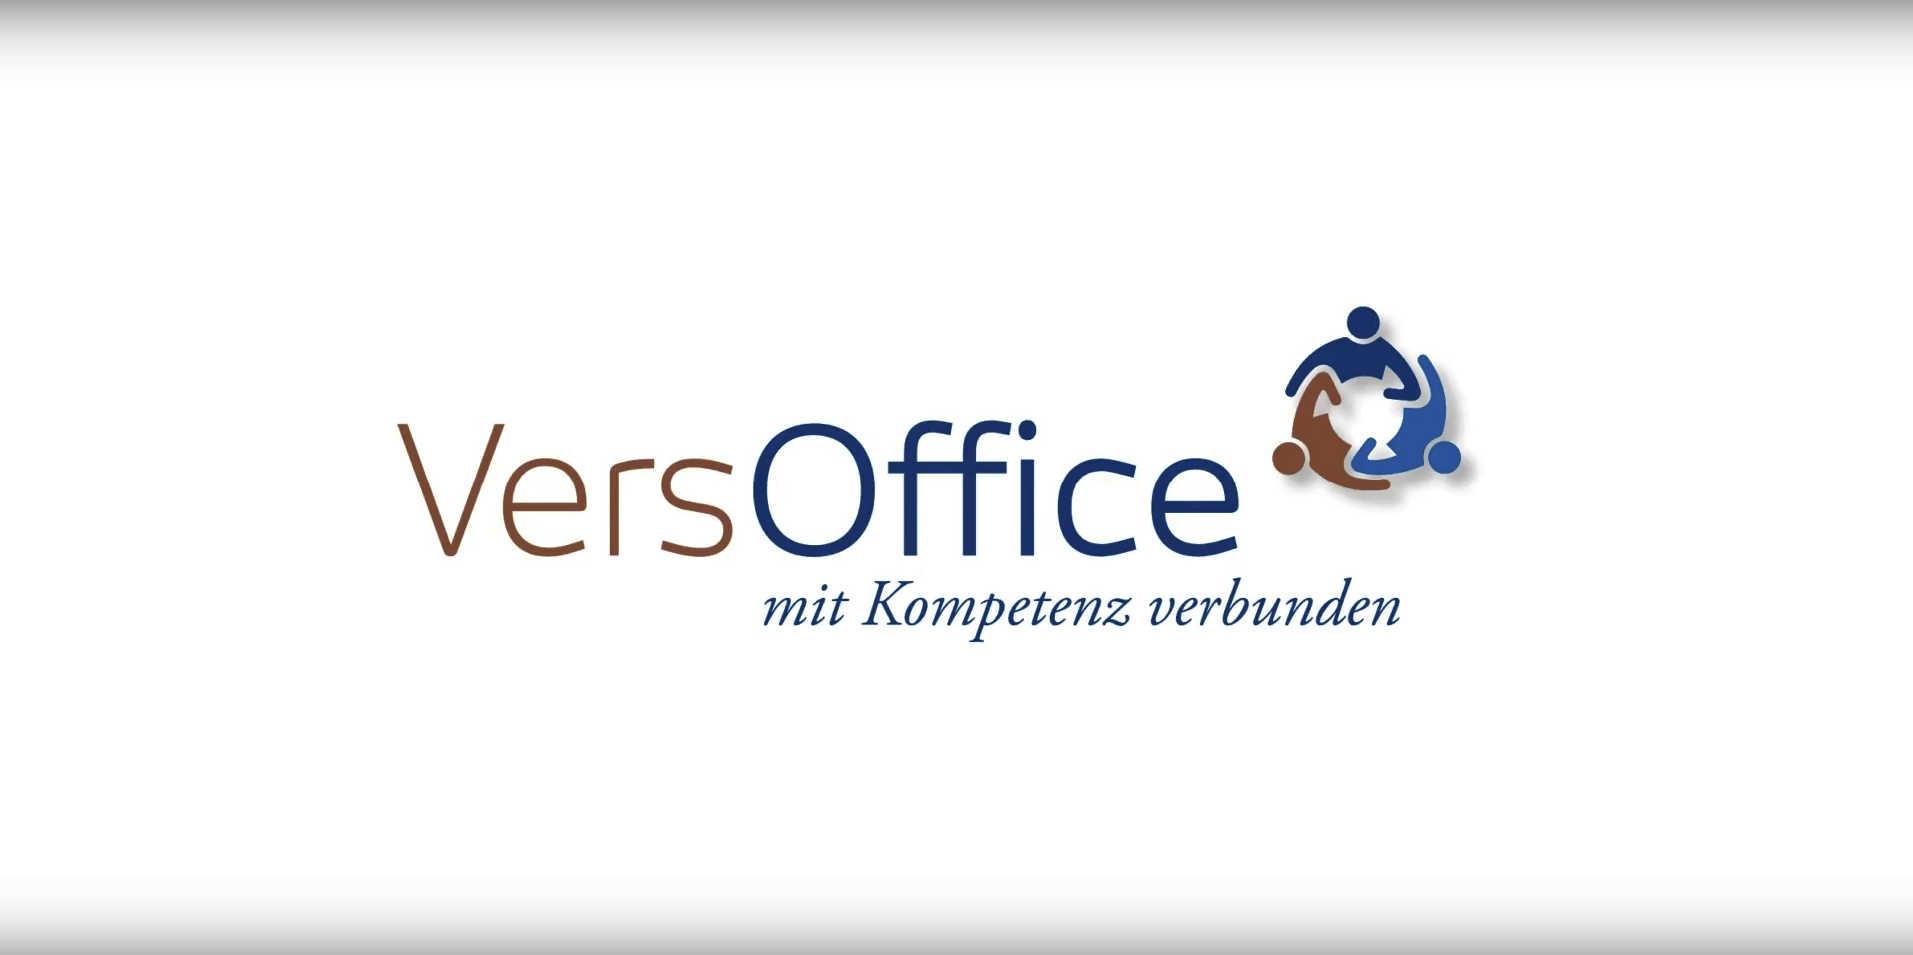 Versoffice Videobg 1802